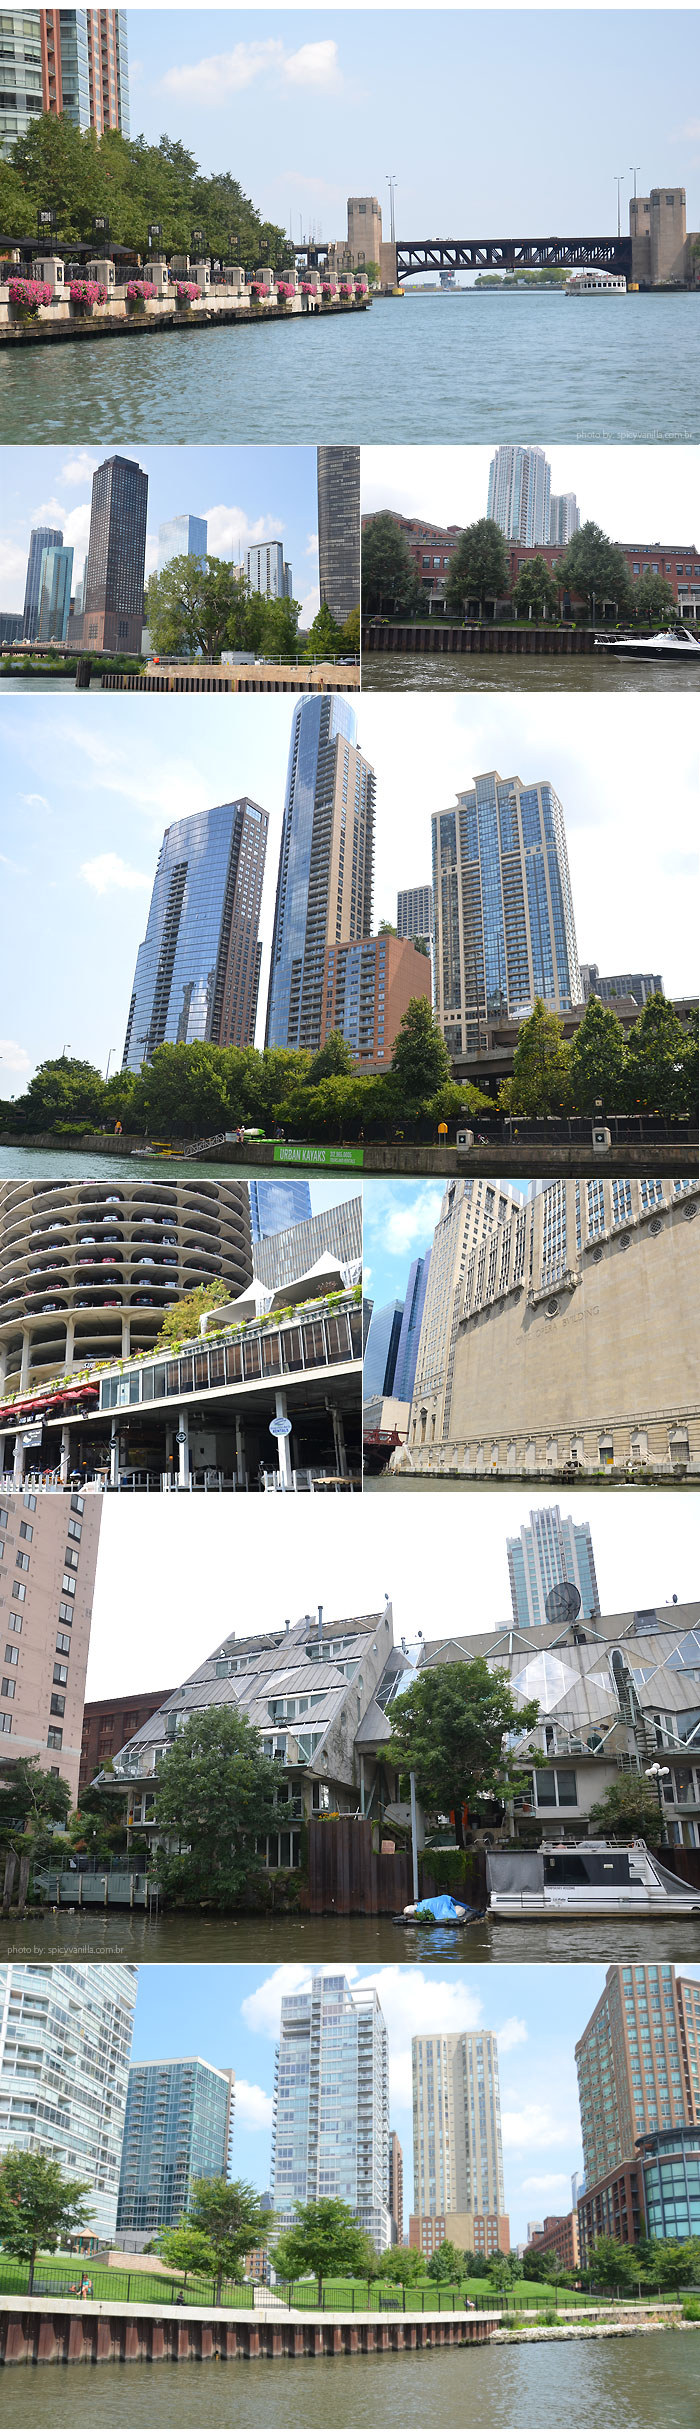 Architecture_River_Cruise_chicago